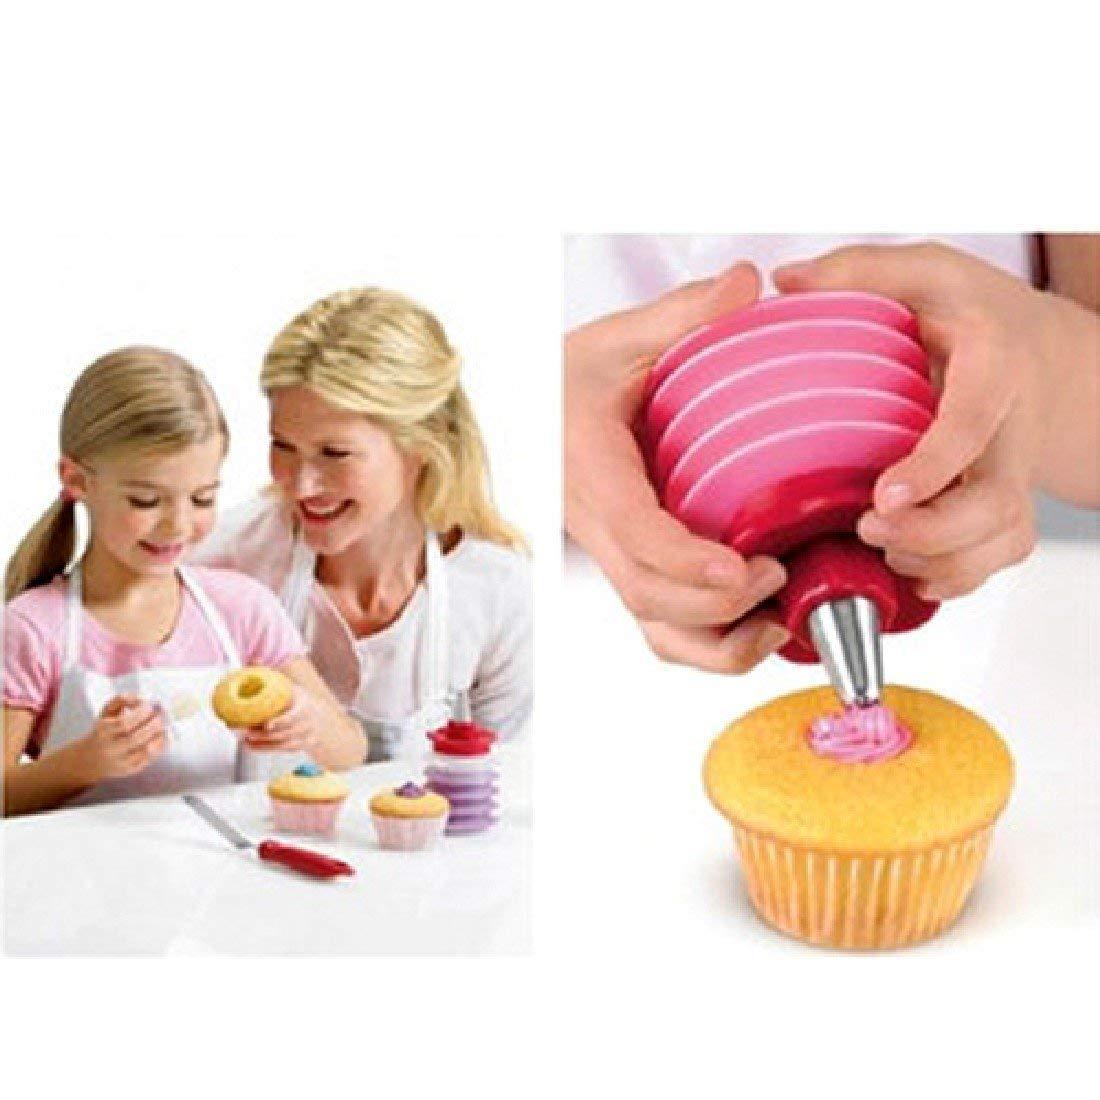 Ouken Fulldream 1pc Cake Corer Cutter Plunger Pastry Cupcake Decorating Divider Filler Model New